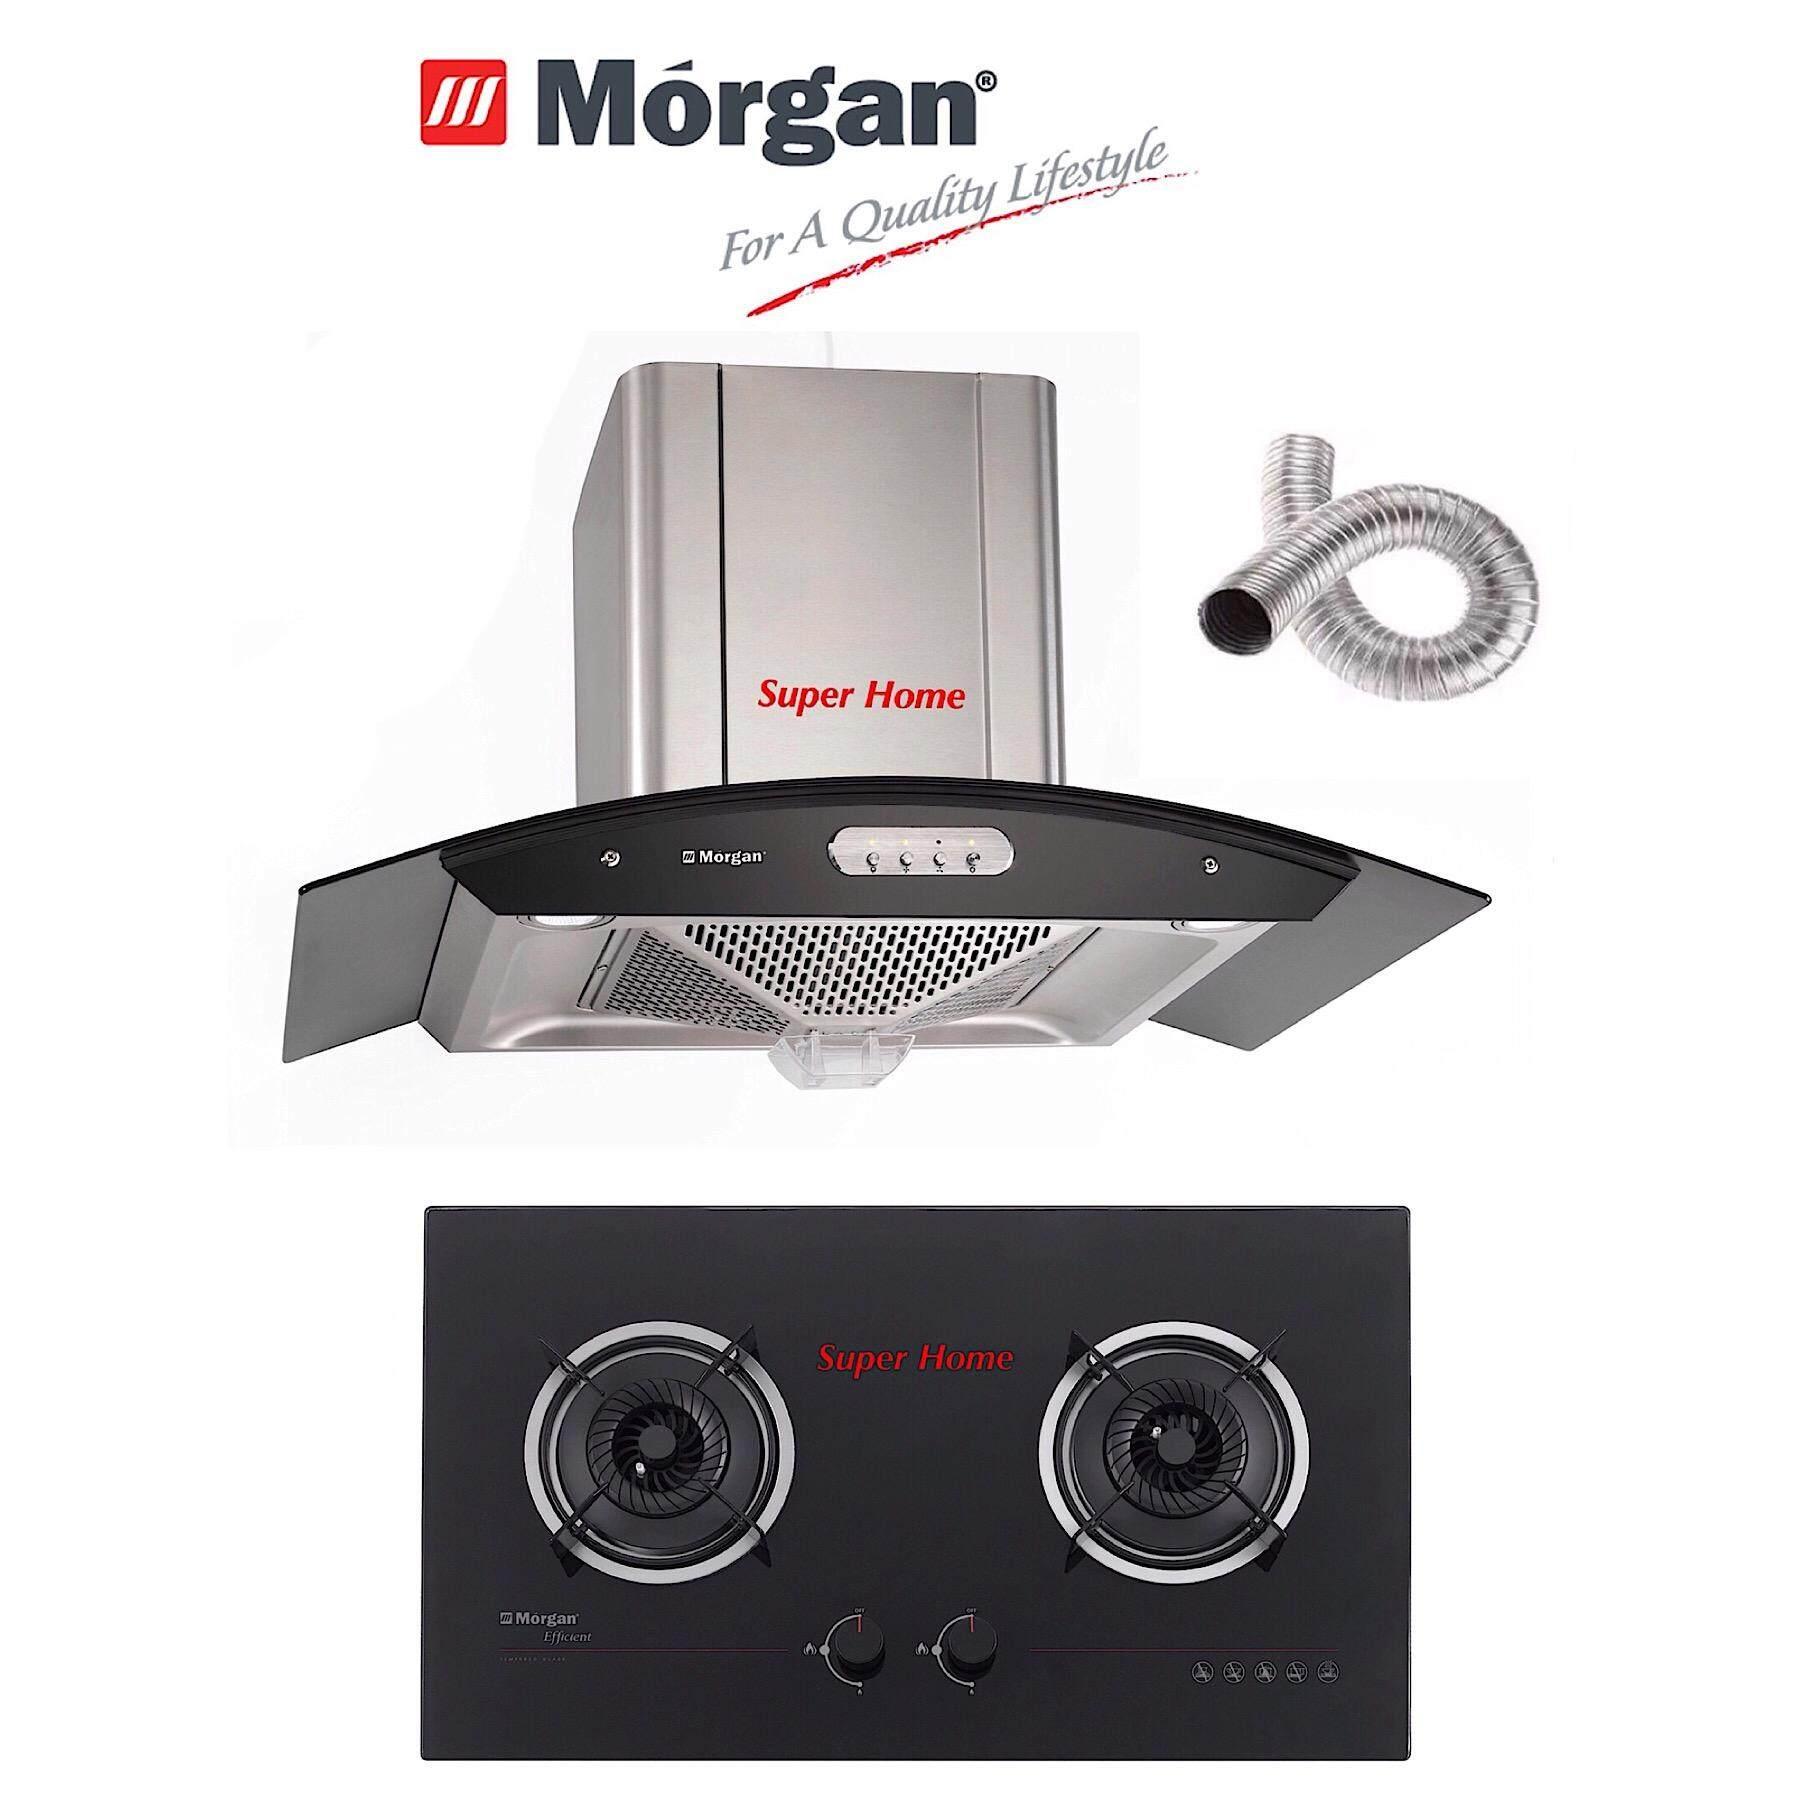 Morgan Designer Hood Mdh 920oc Built In Cooker Hob Mbh Gc1132bk